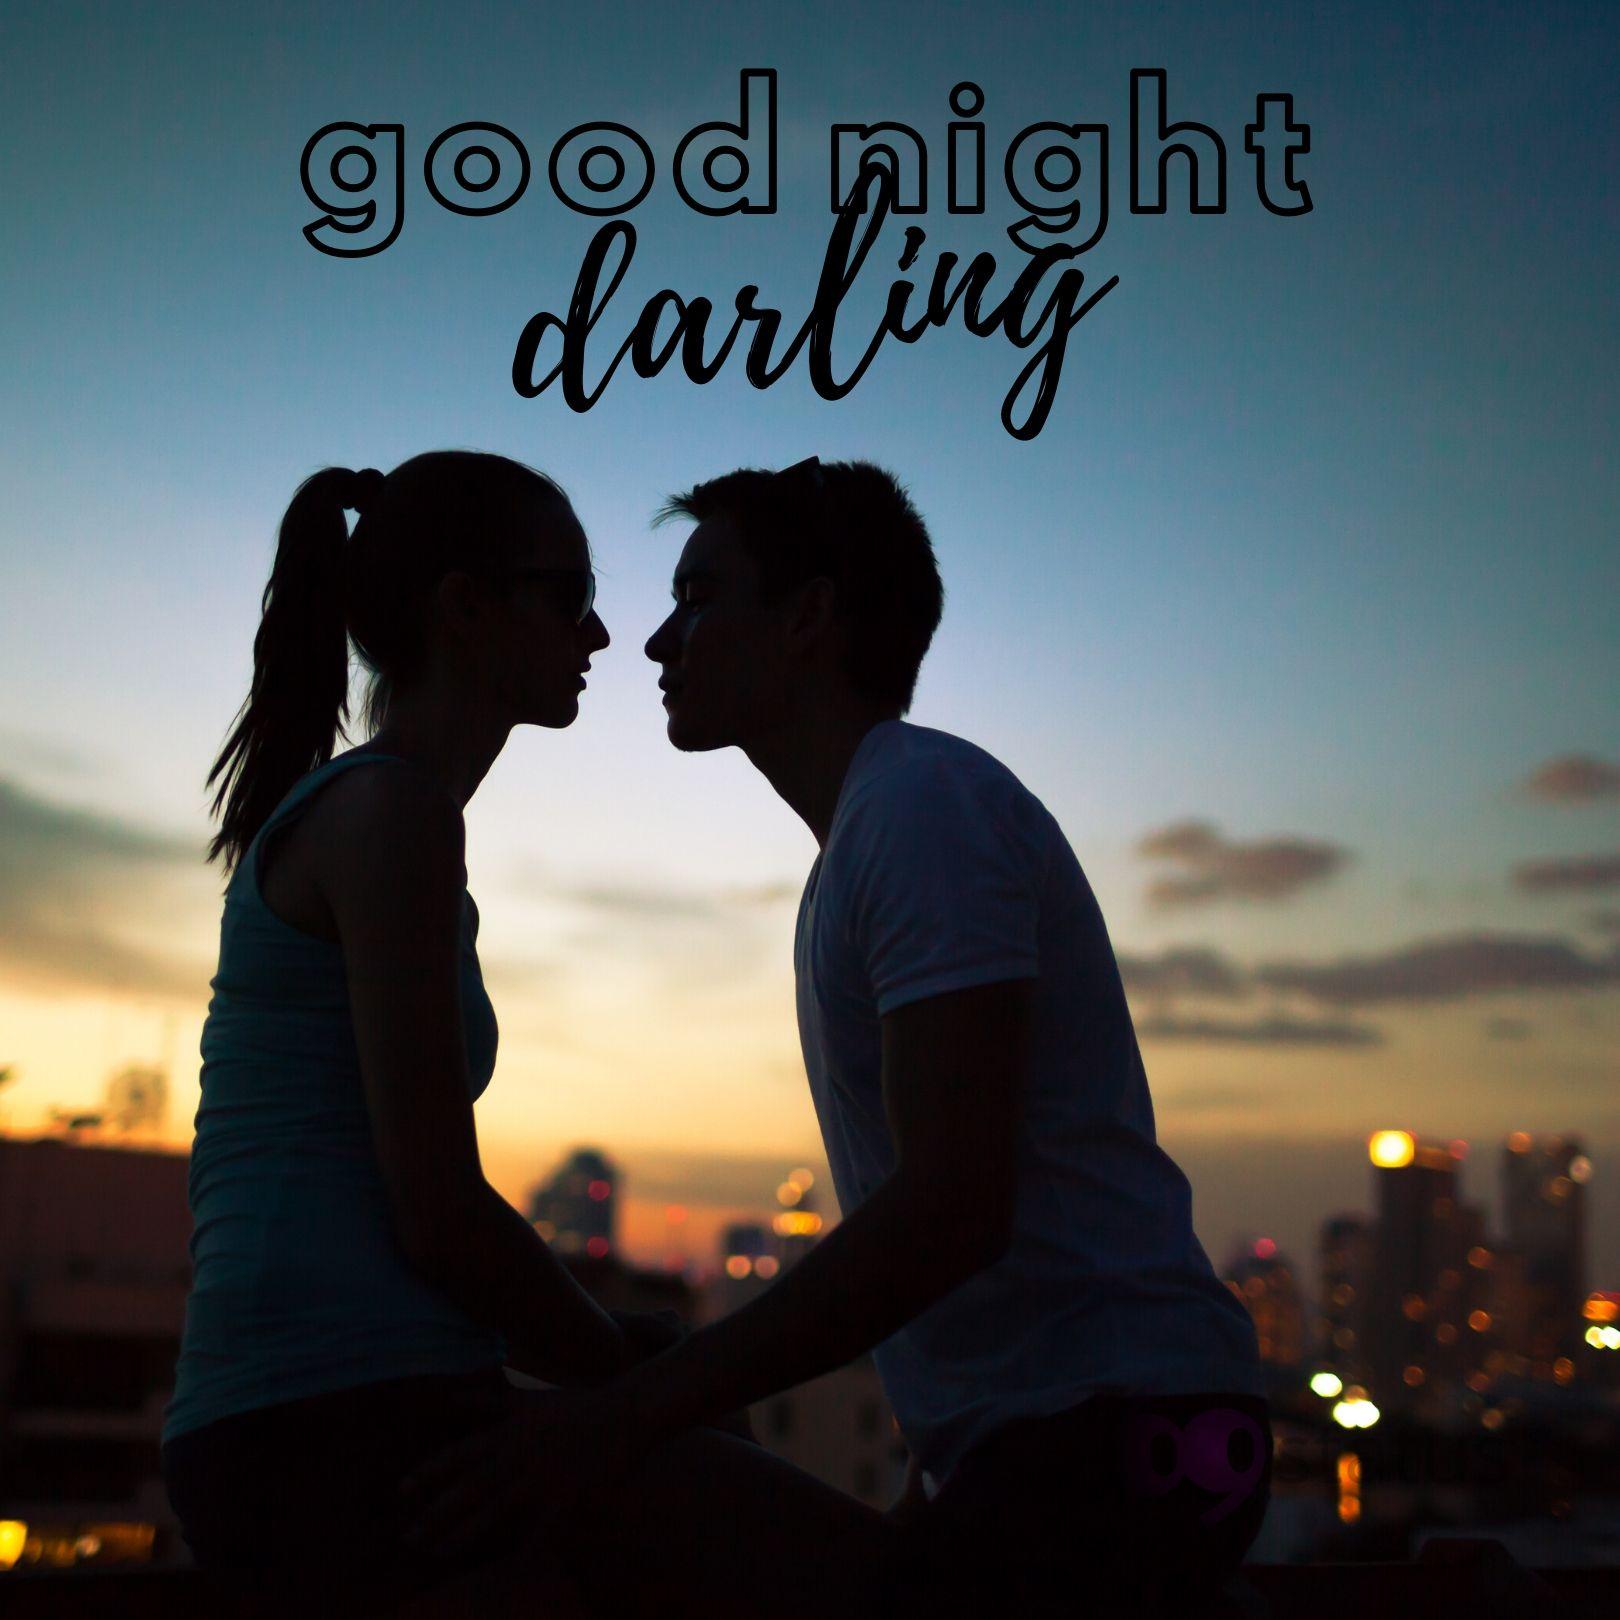 Good Night darling full HD free download.